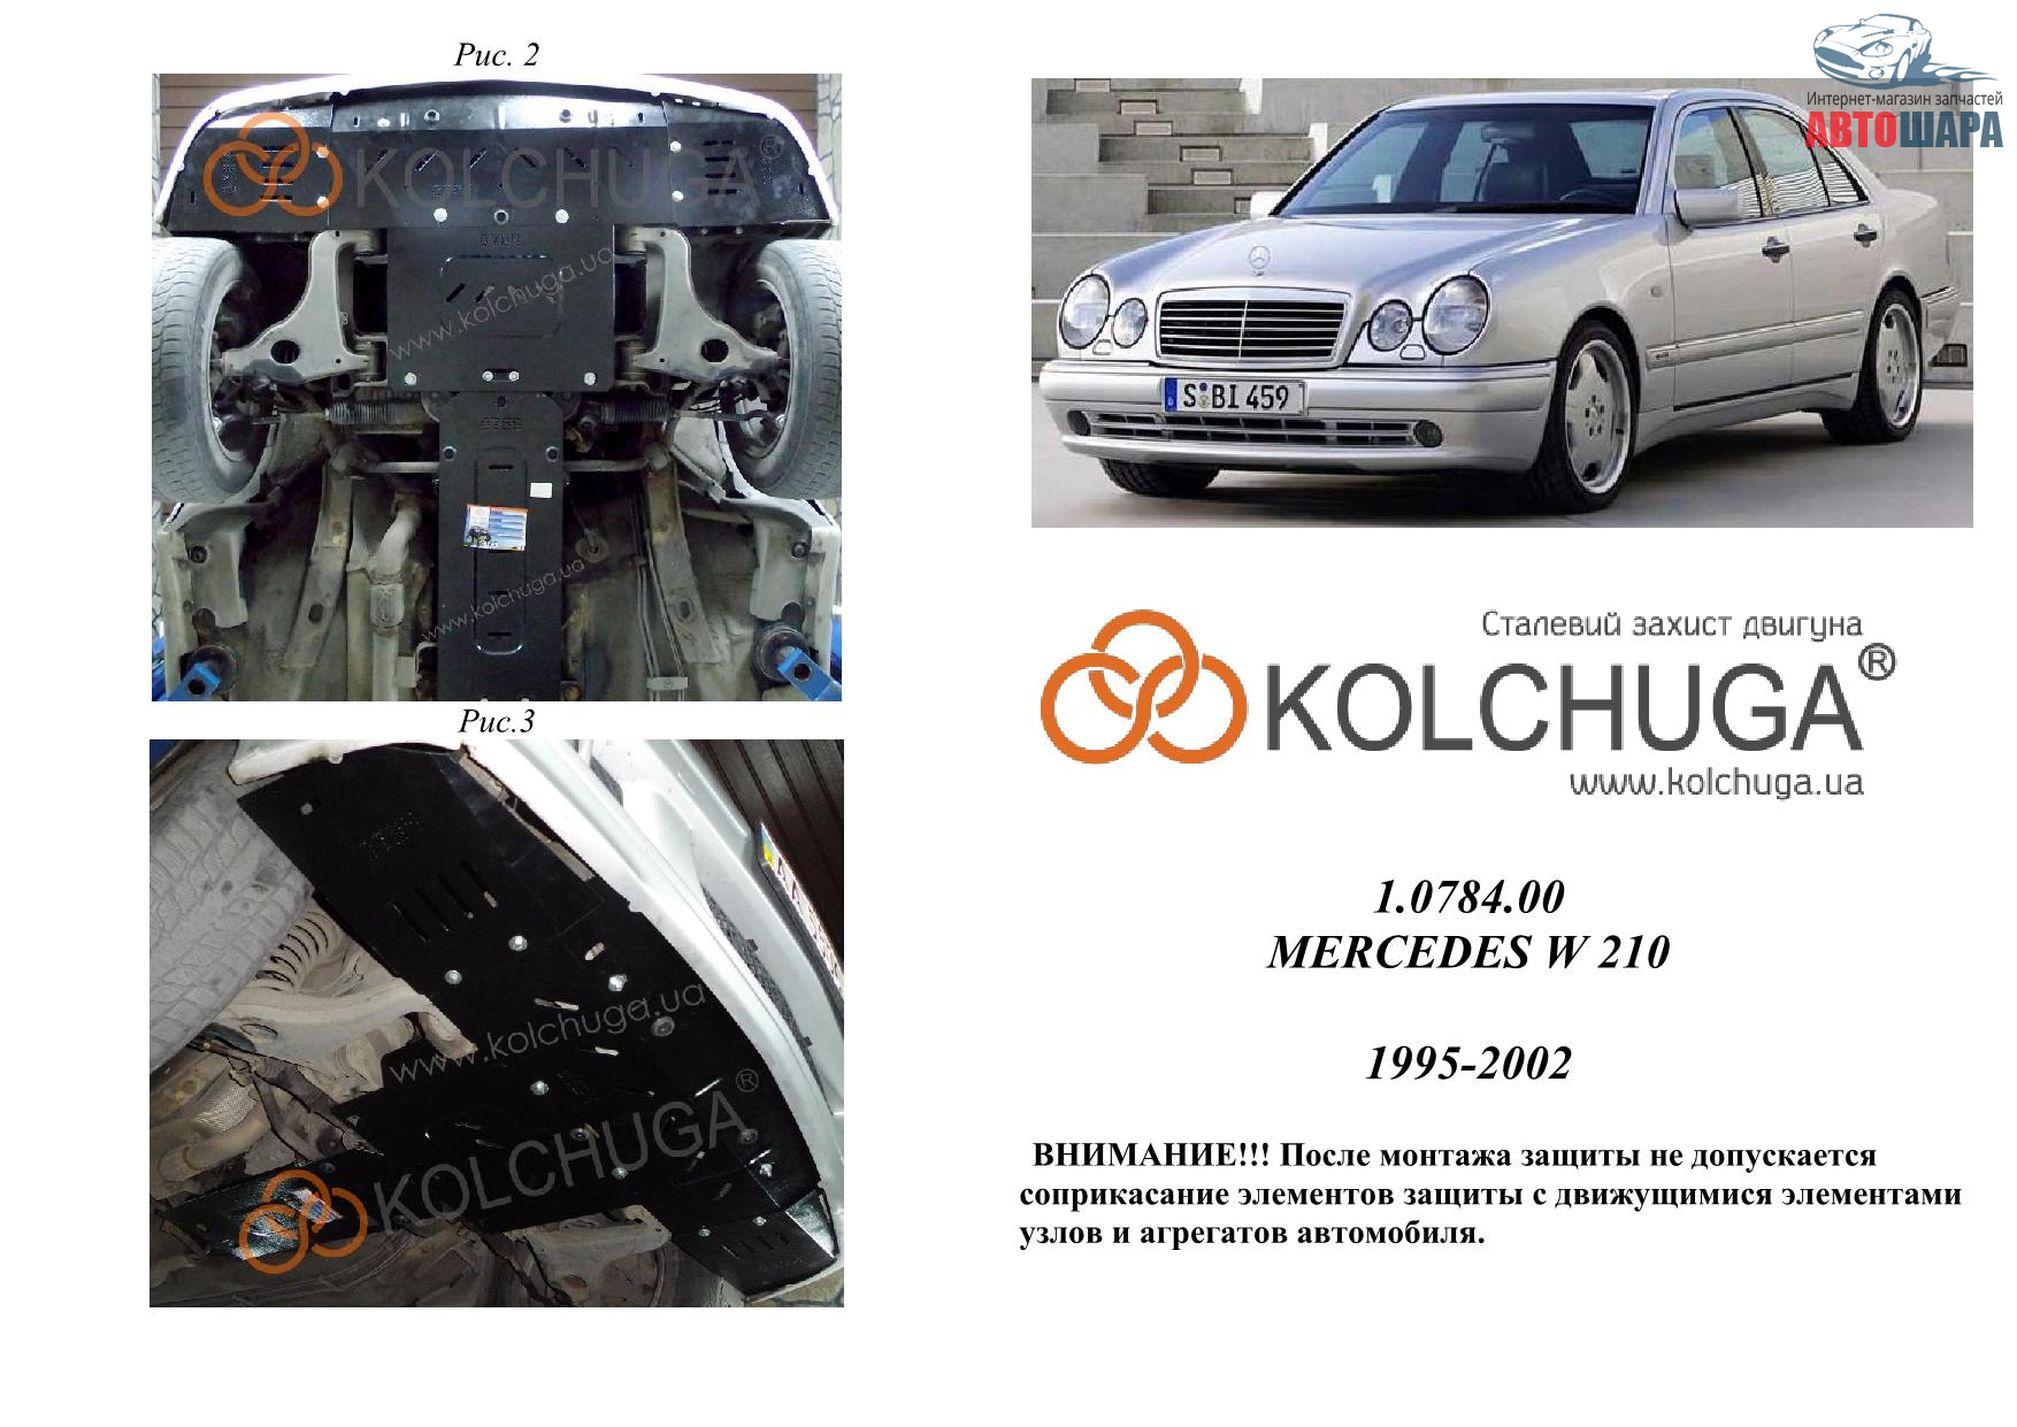 Защита Mercedes Benz W 210 1995 2001 V все окрім 4 Matik